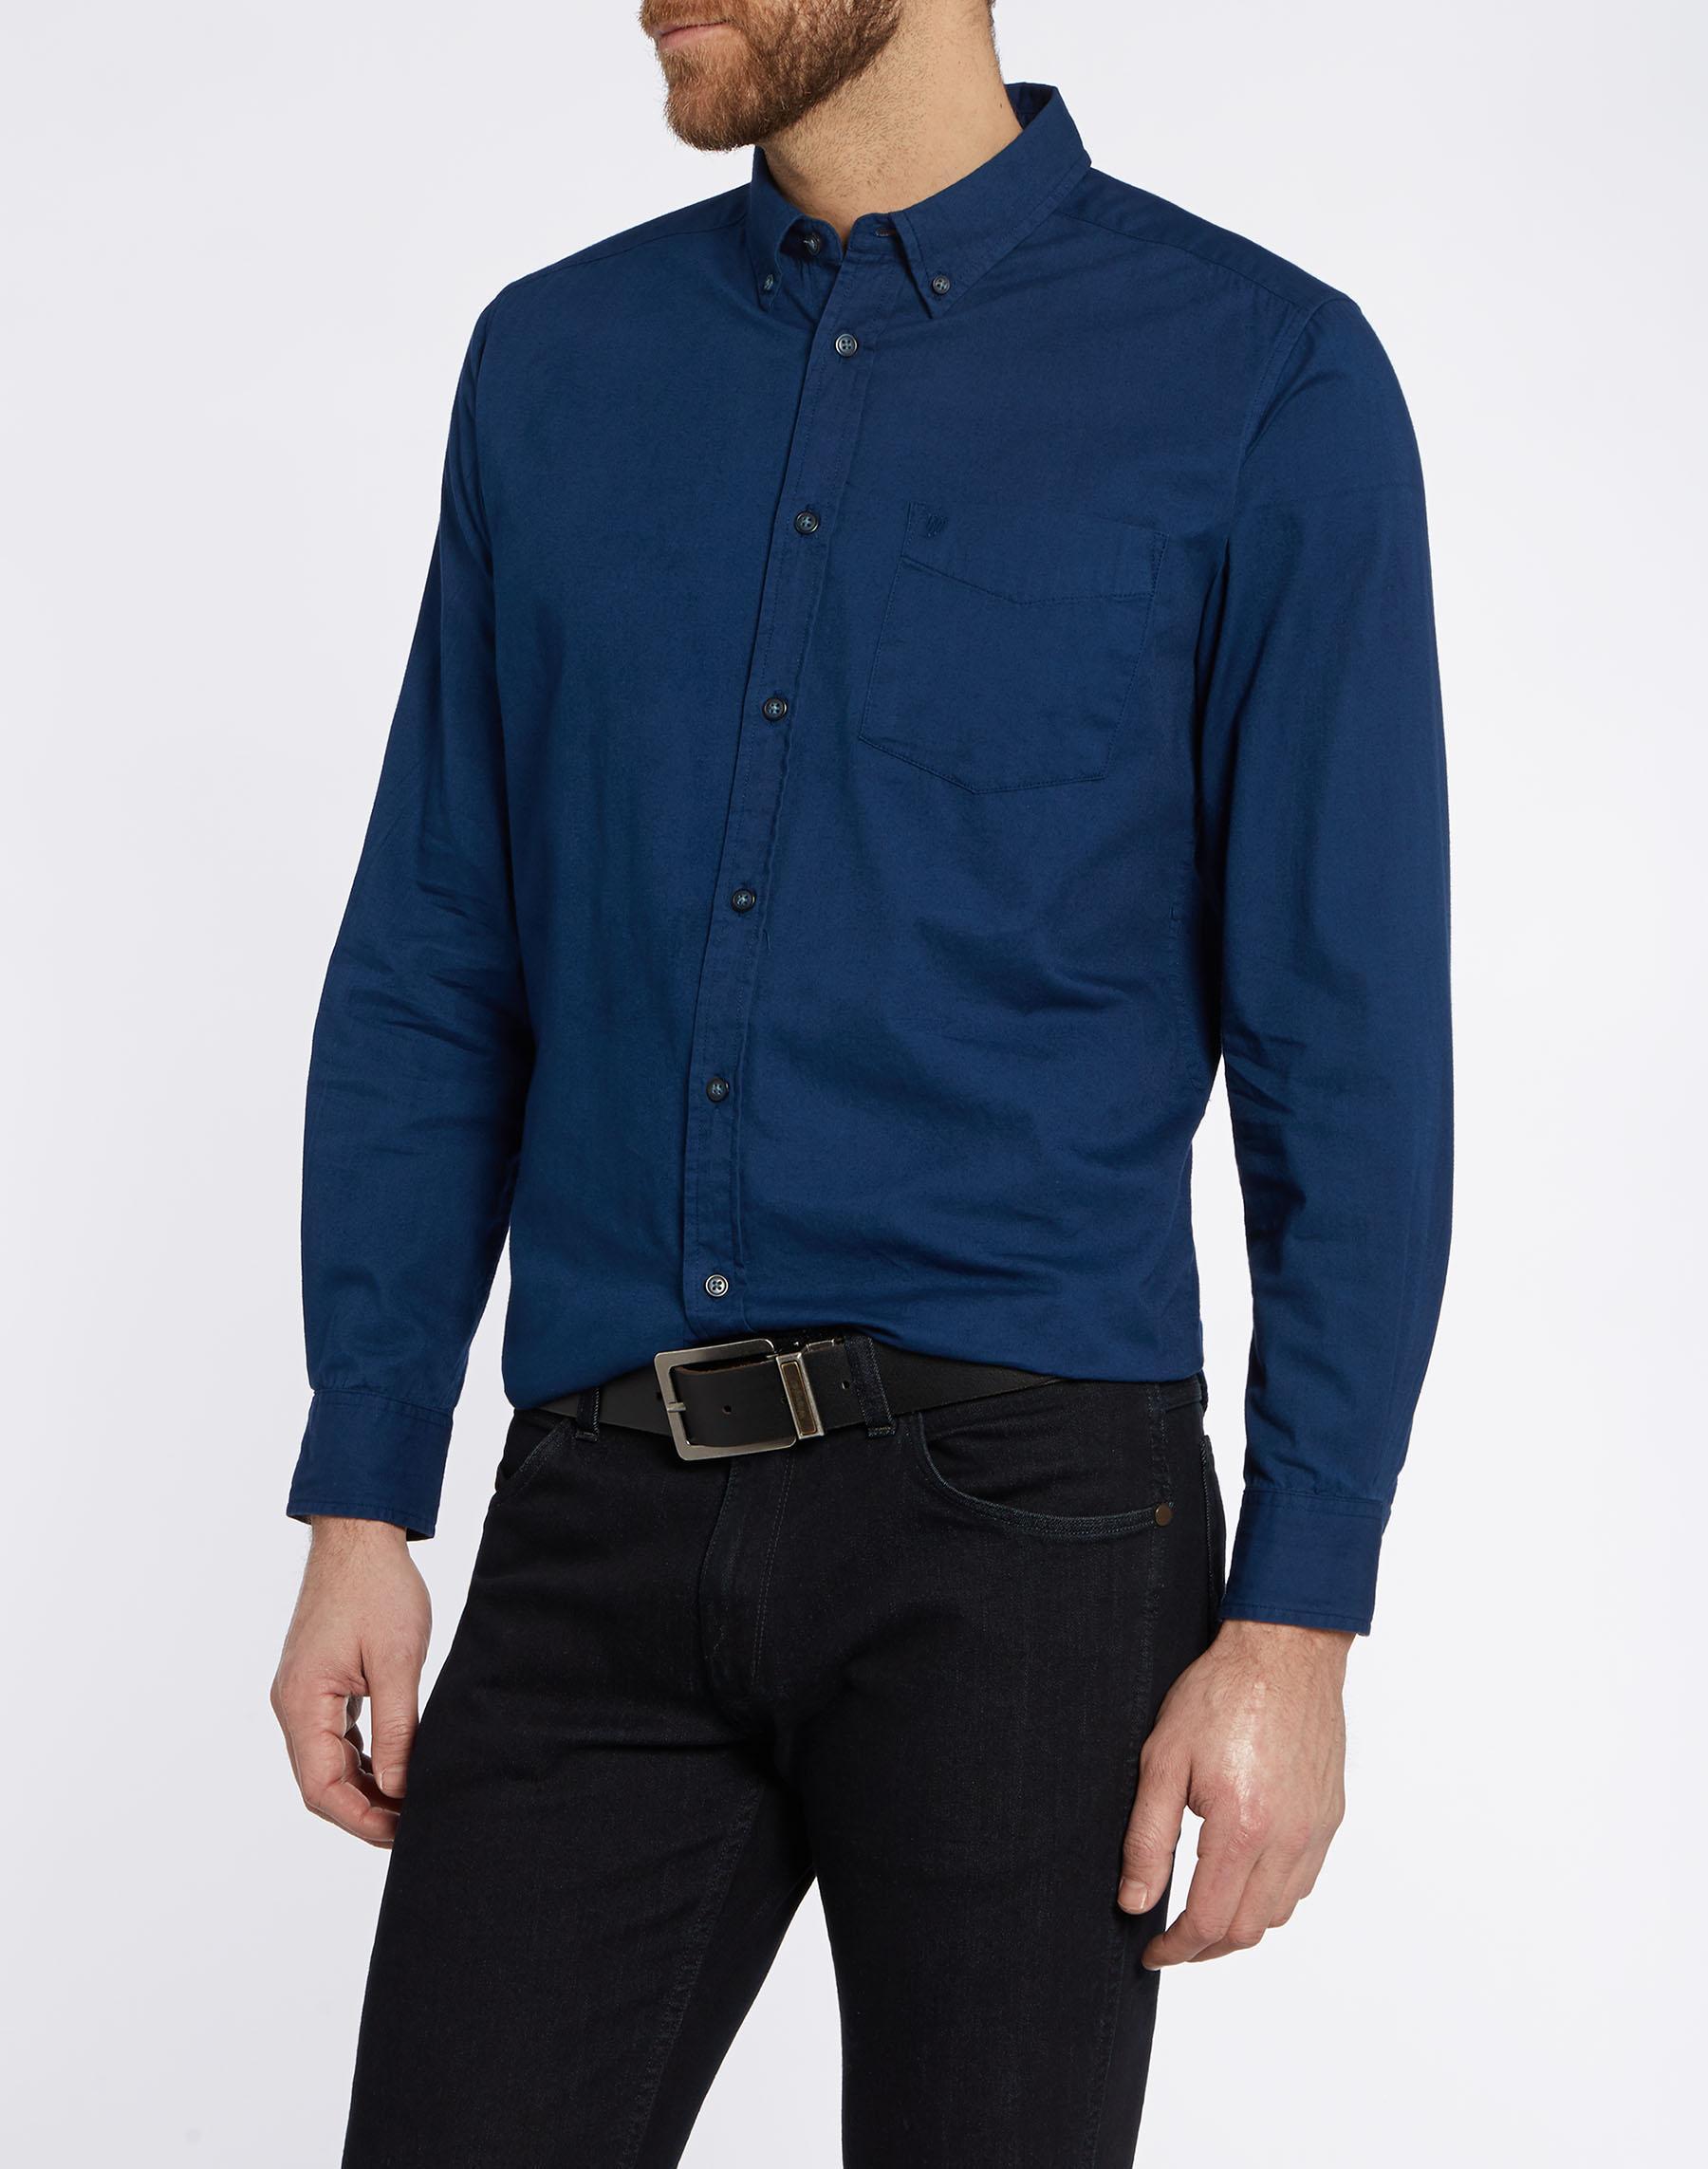 cb178b50b9d Pánská košile WRANGLER W58835Y09 SLIM FIT Estate Blue Velikost  XL